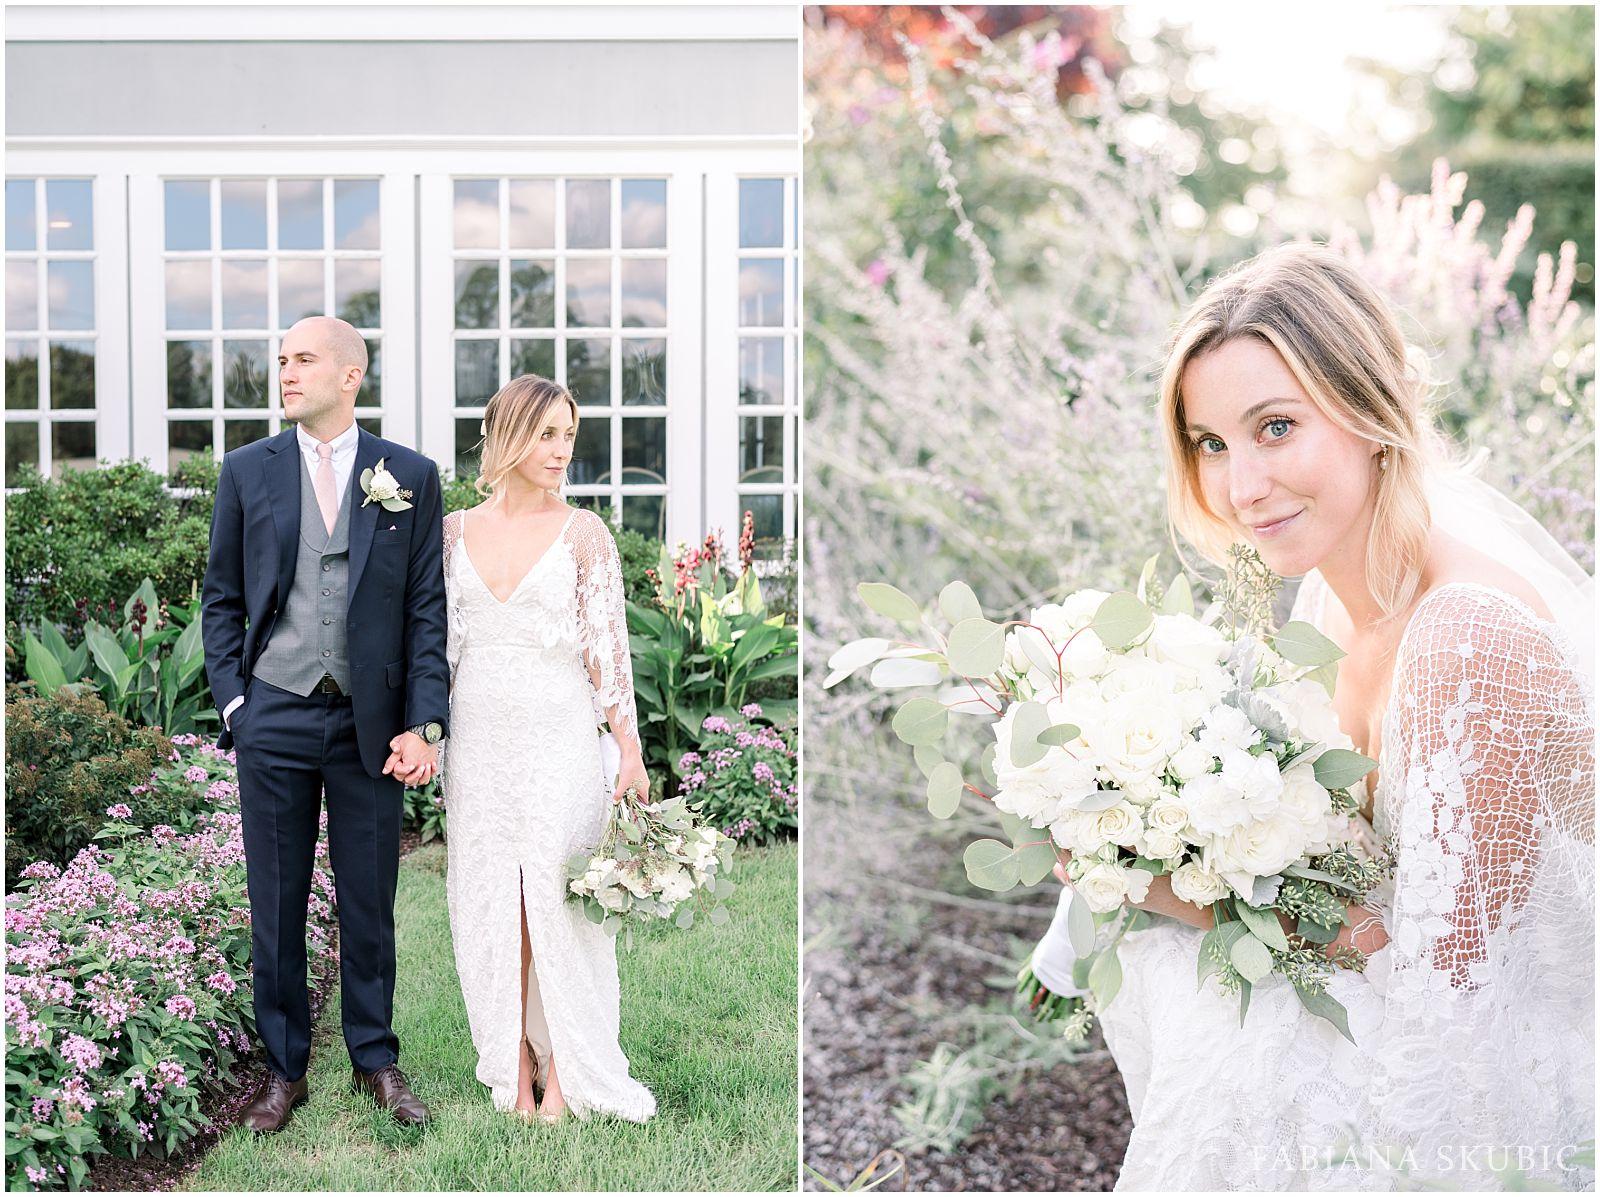 FabianaSkubic_H&M_Wedding_0035.jpg